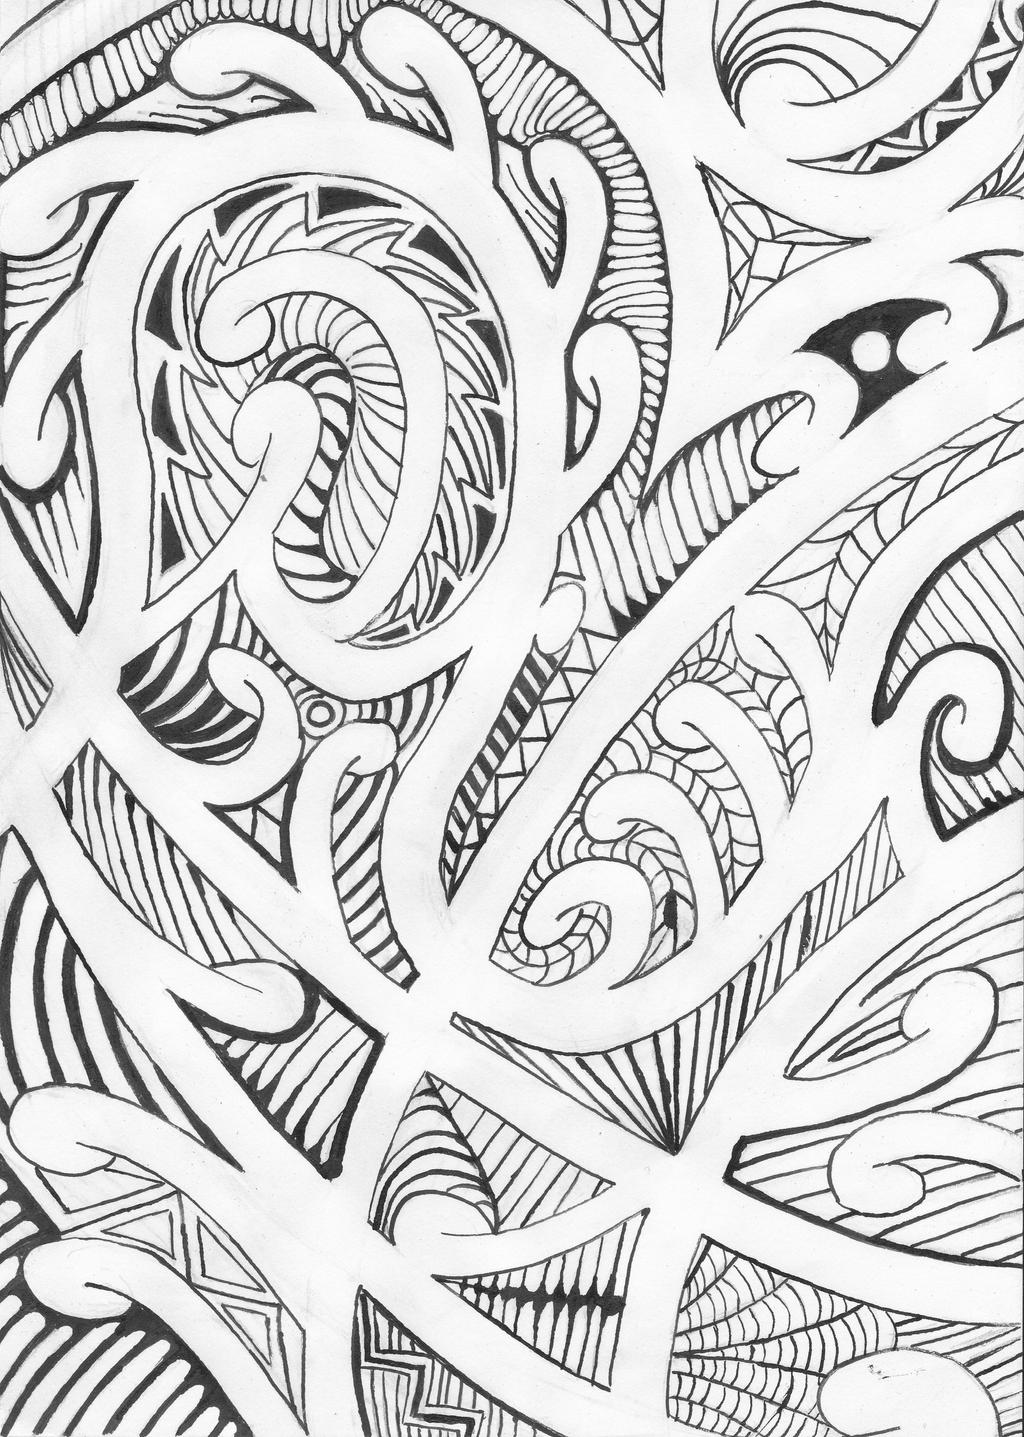 Traditional Maori Art: Maori Design By Victorverhart On DeviantArt